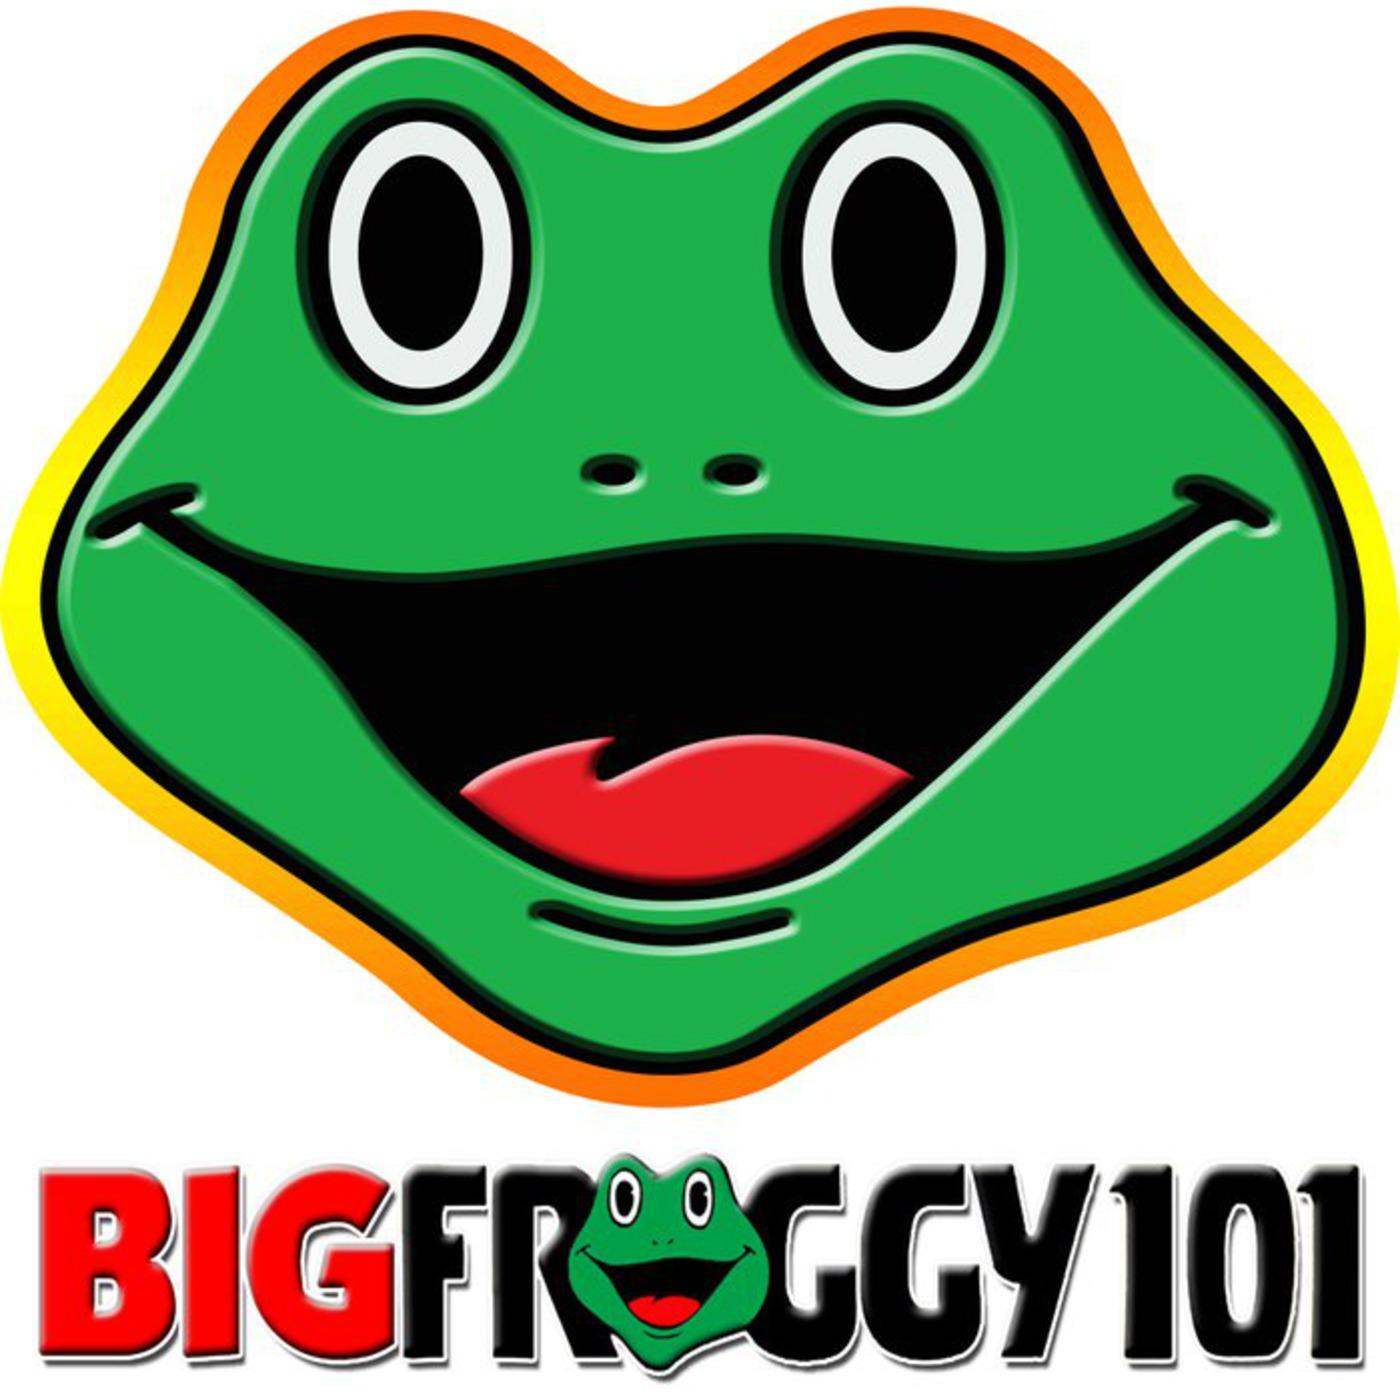 BIG Froggy 101's Pondcast